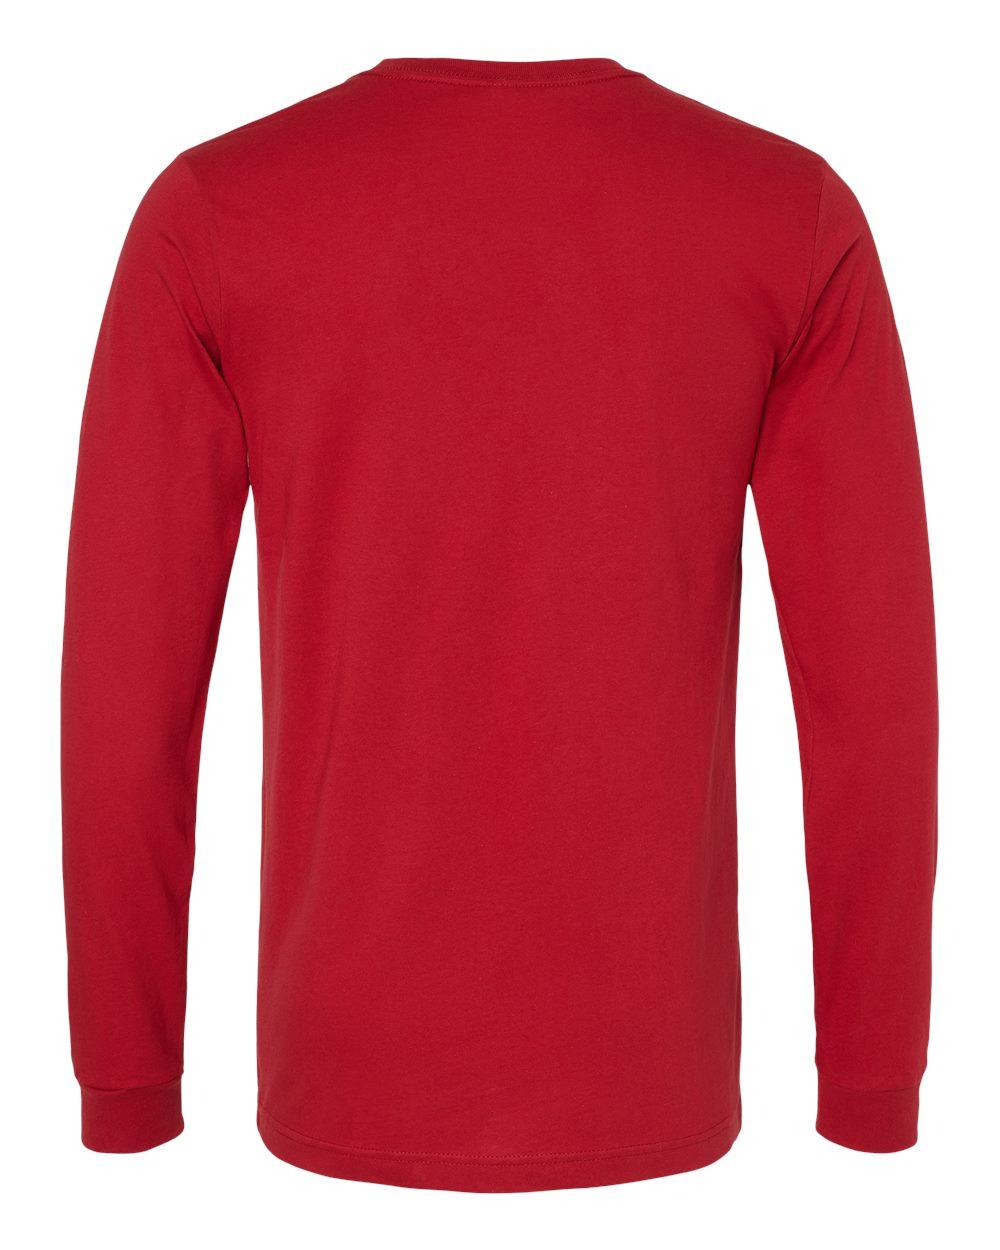 Bella-Canvas-Mens-Blank-Top-Long-Sleeve-Jersey-Tee-T-Shirt-3501-up-to-3XL thumbnail 25